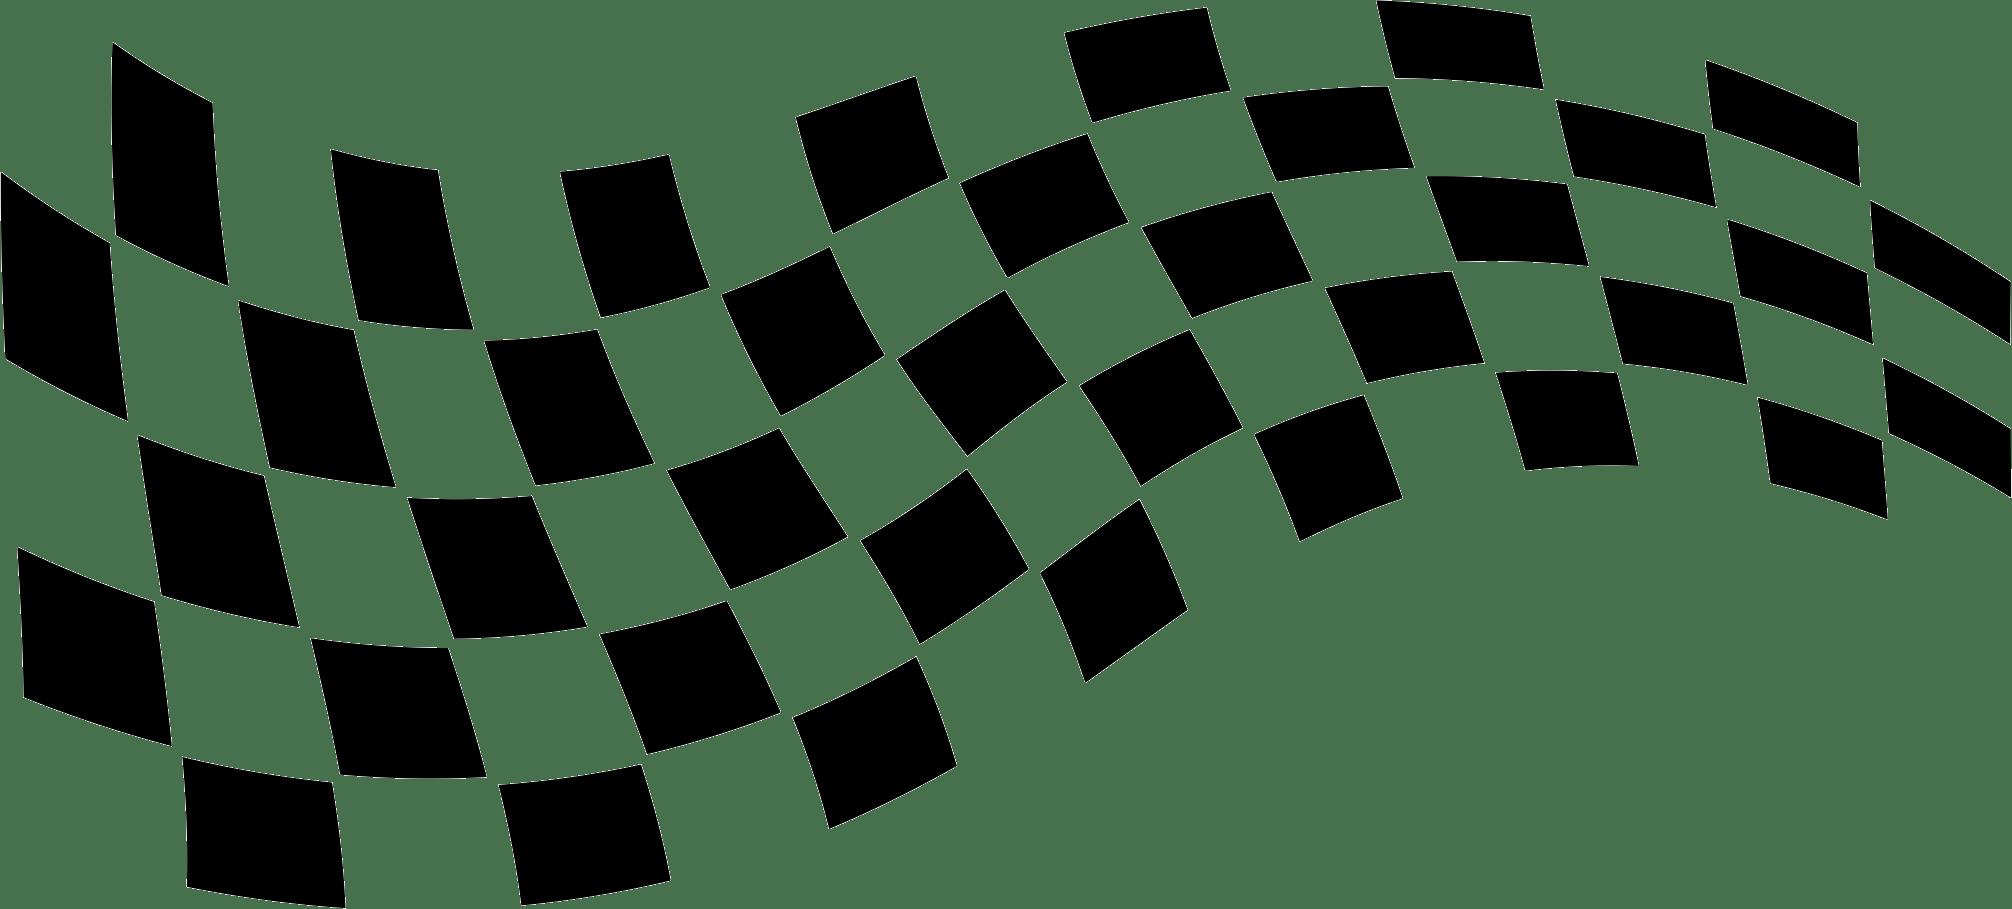 Racing Border